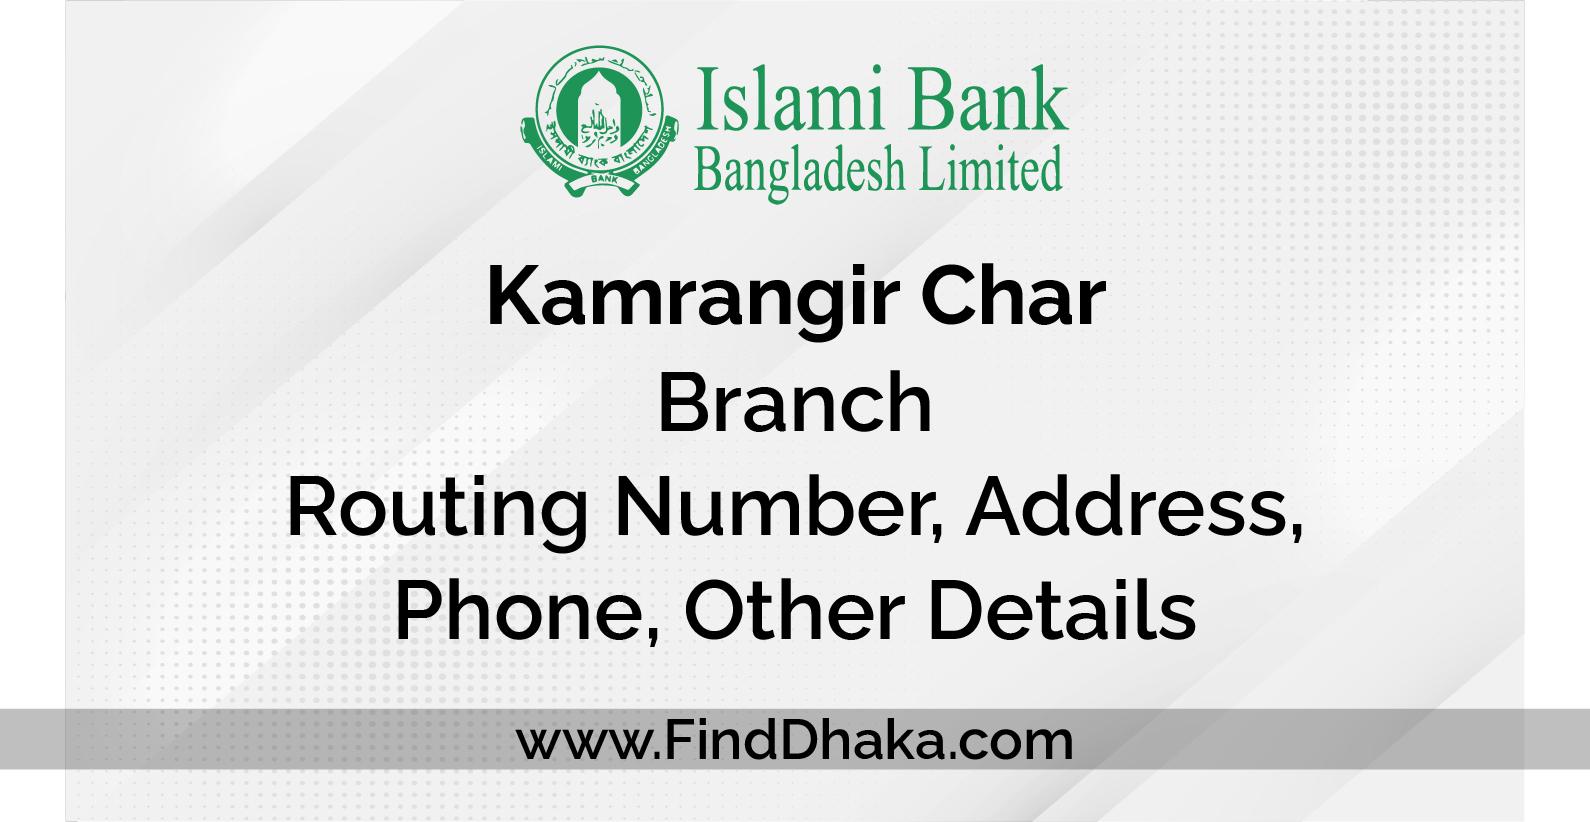 Islami Bank info012000